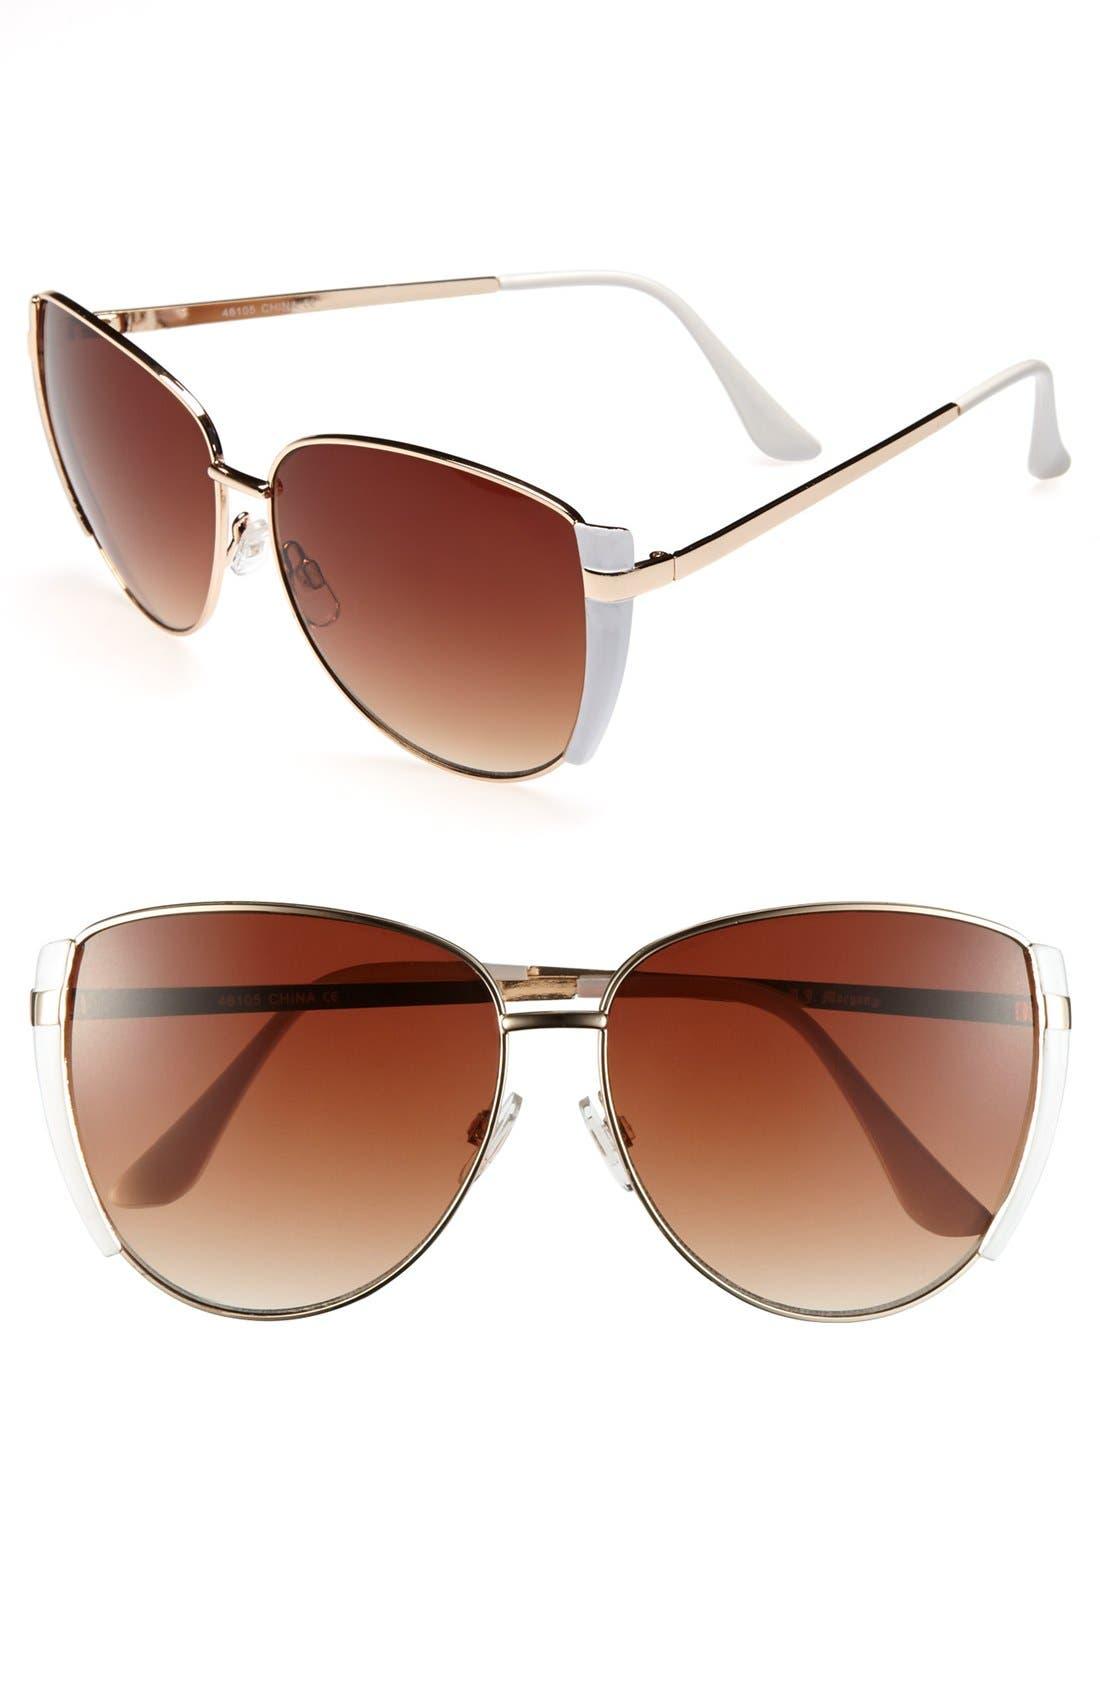 Alternate Image 1 Selected - A.J. Morgan 'Cabo' Sunglasses